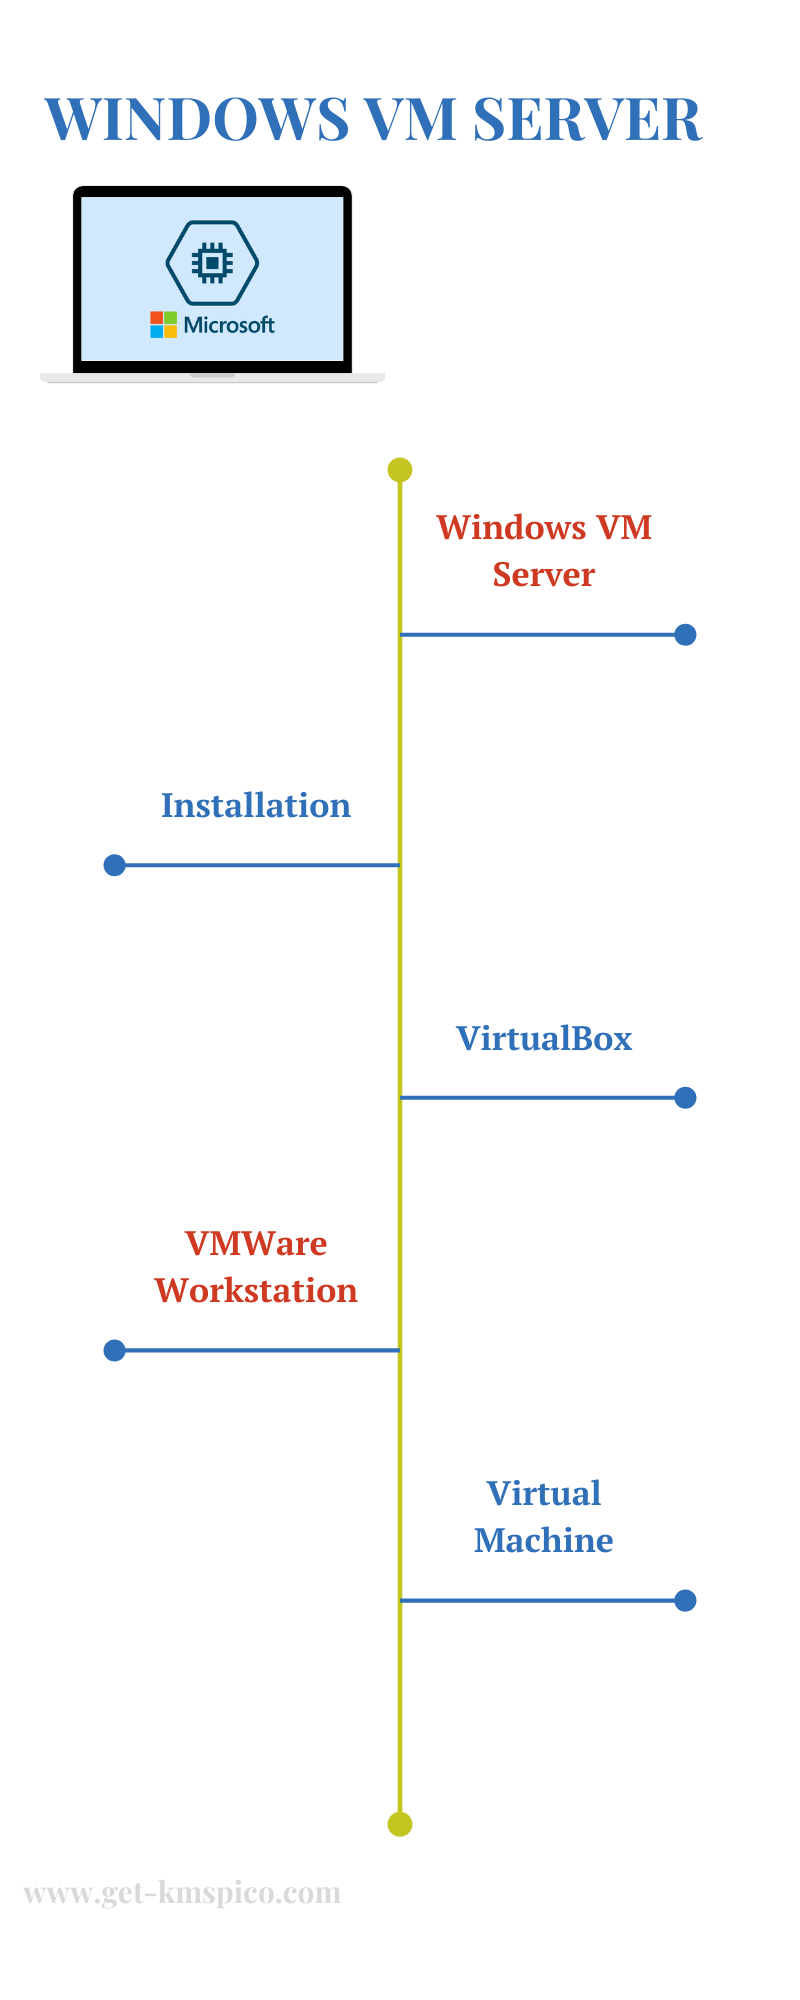 Windows-VM-Server-Infographic